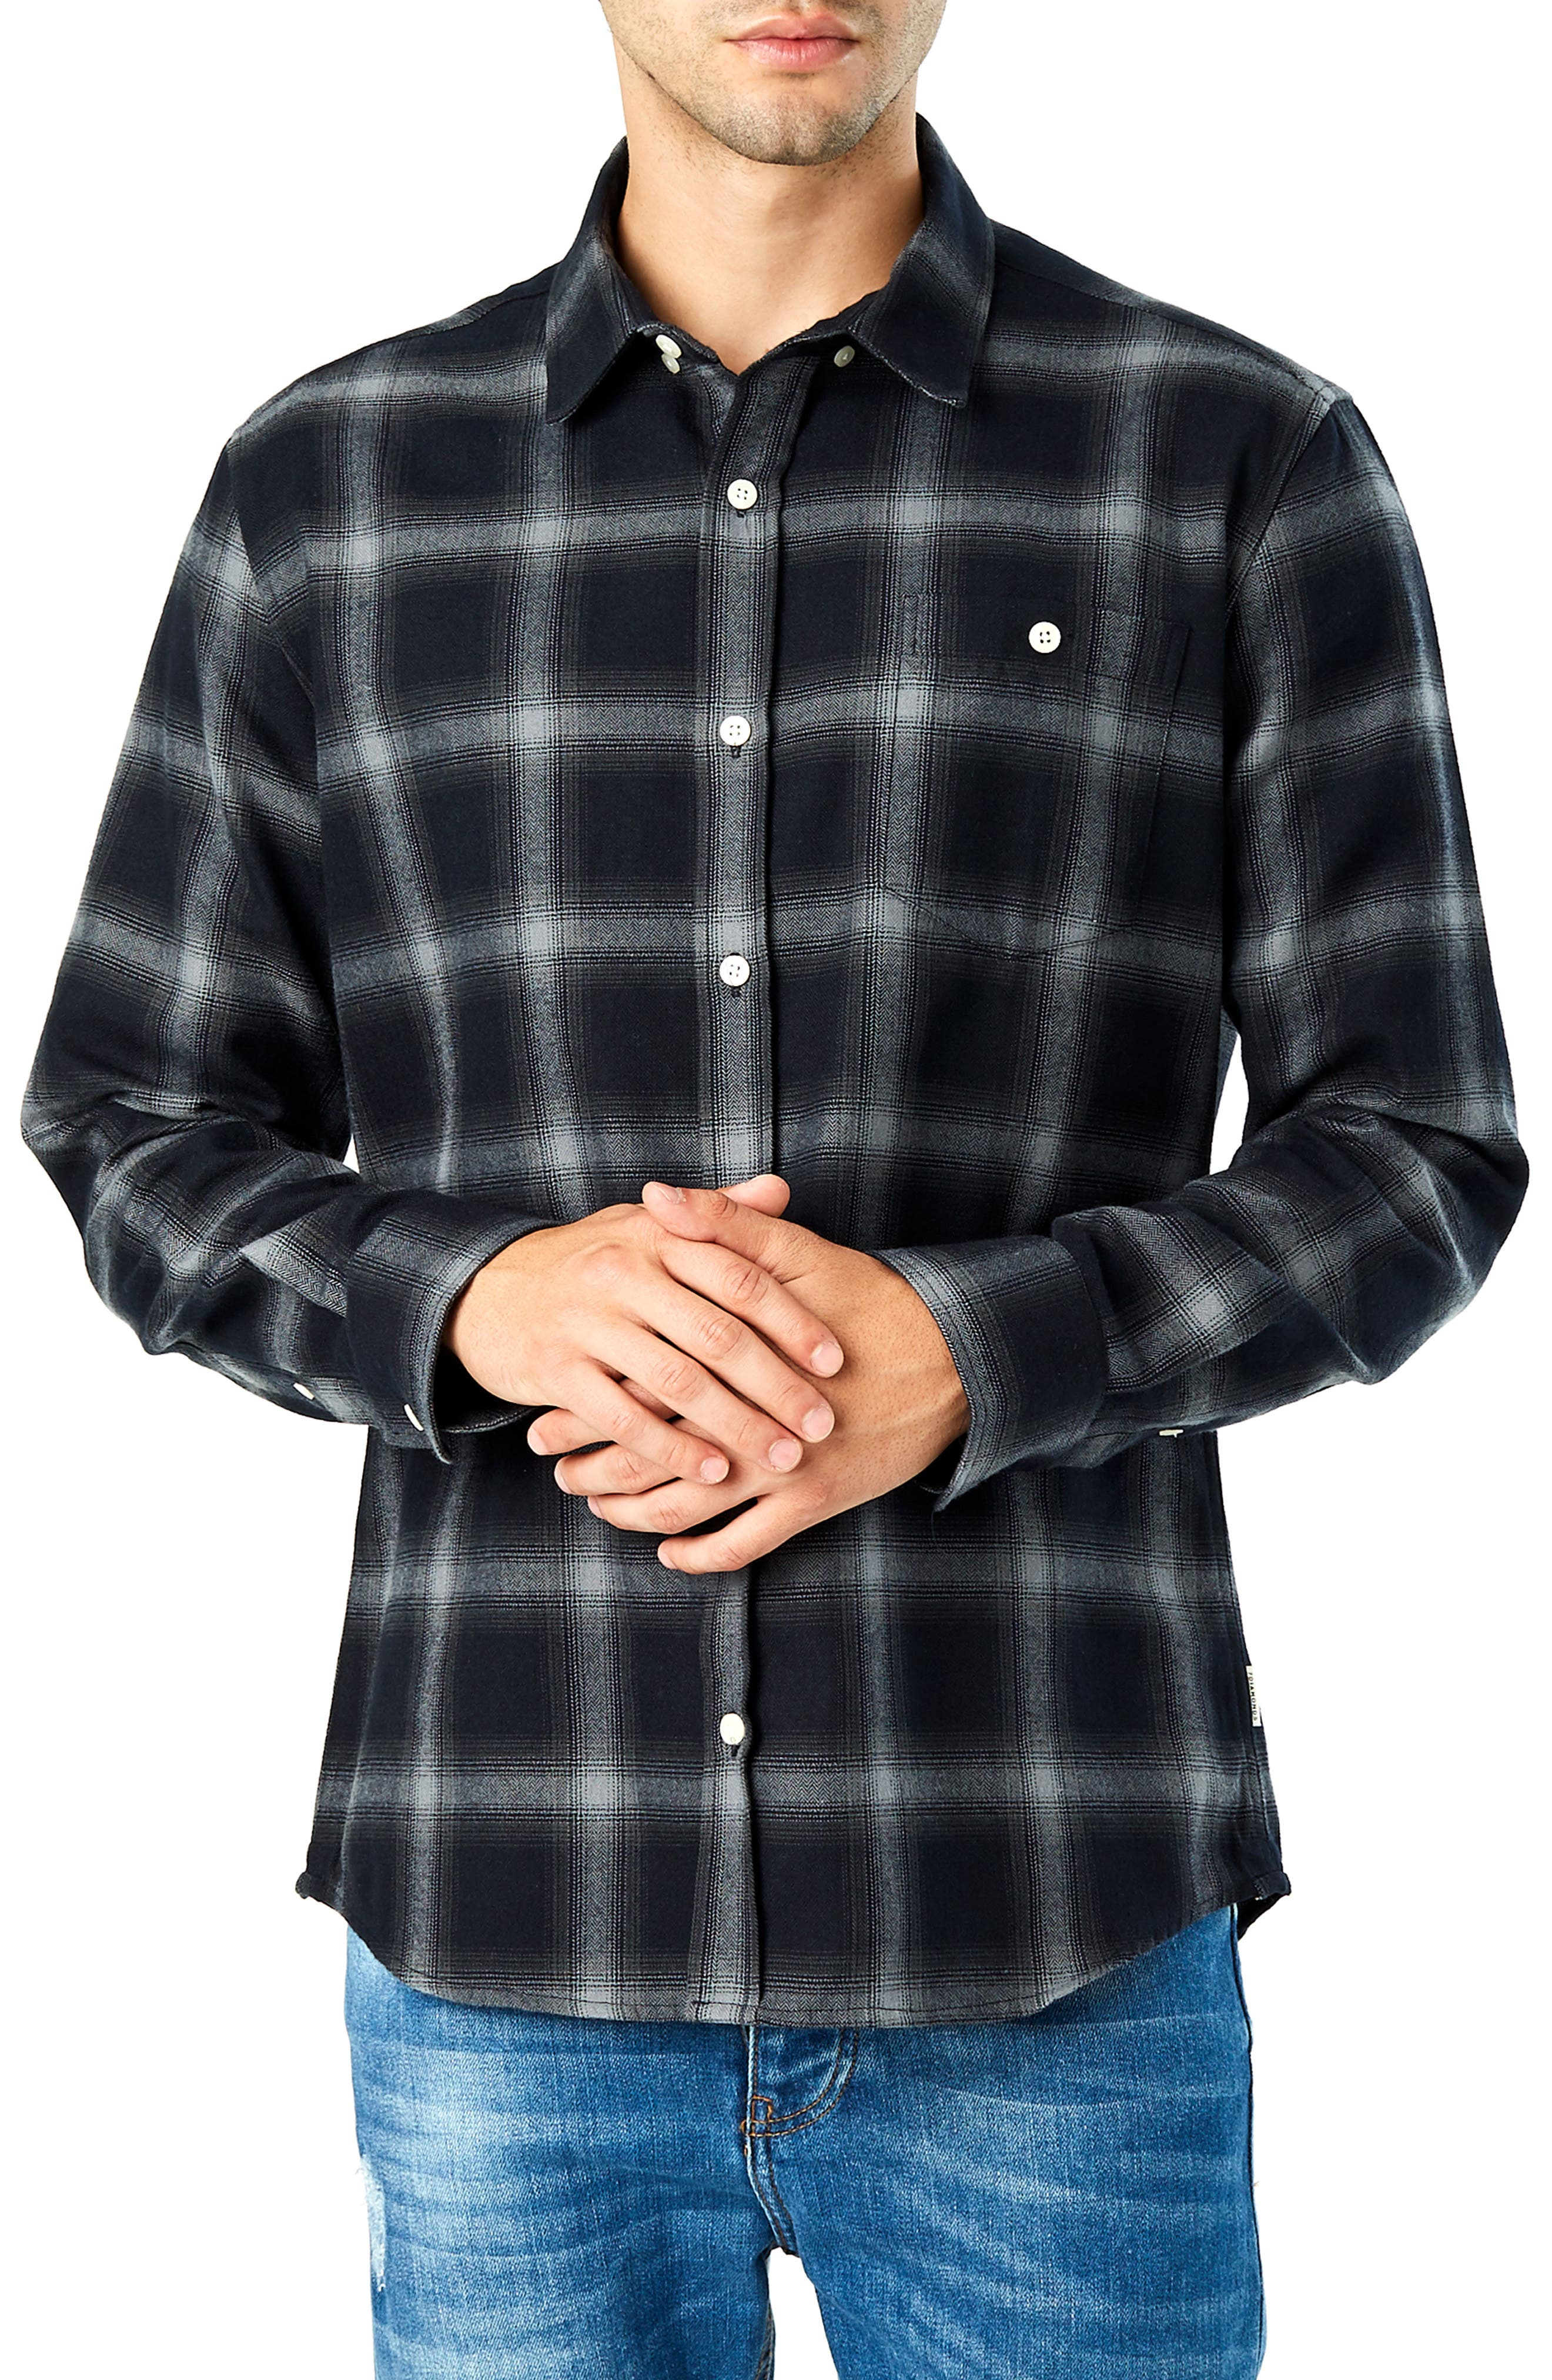 Hawk Slim Fit Sport Shirt,                         Main,                         color, BLACK